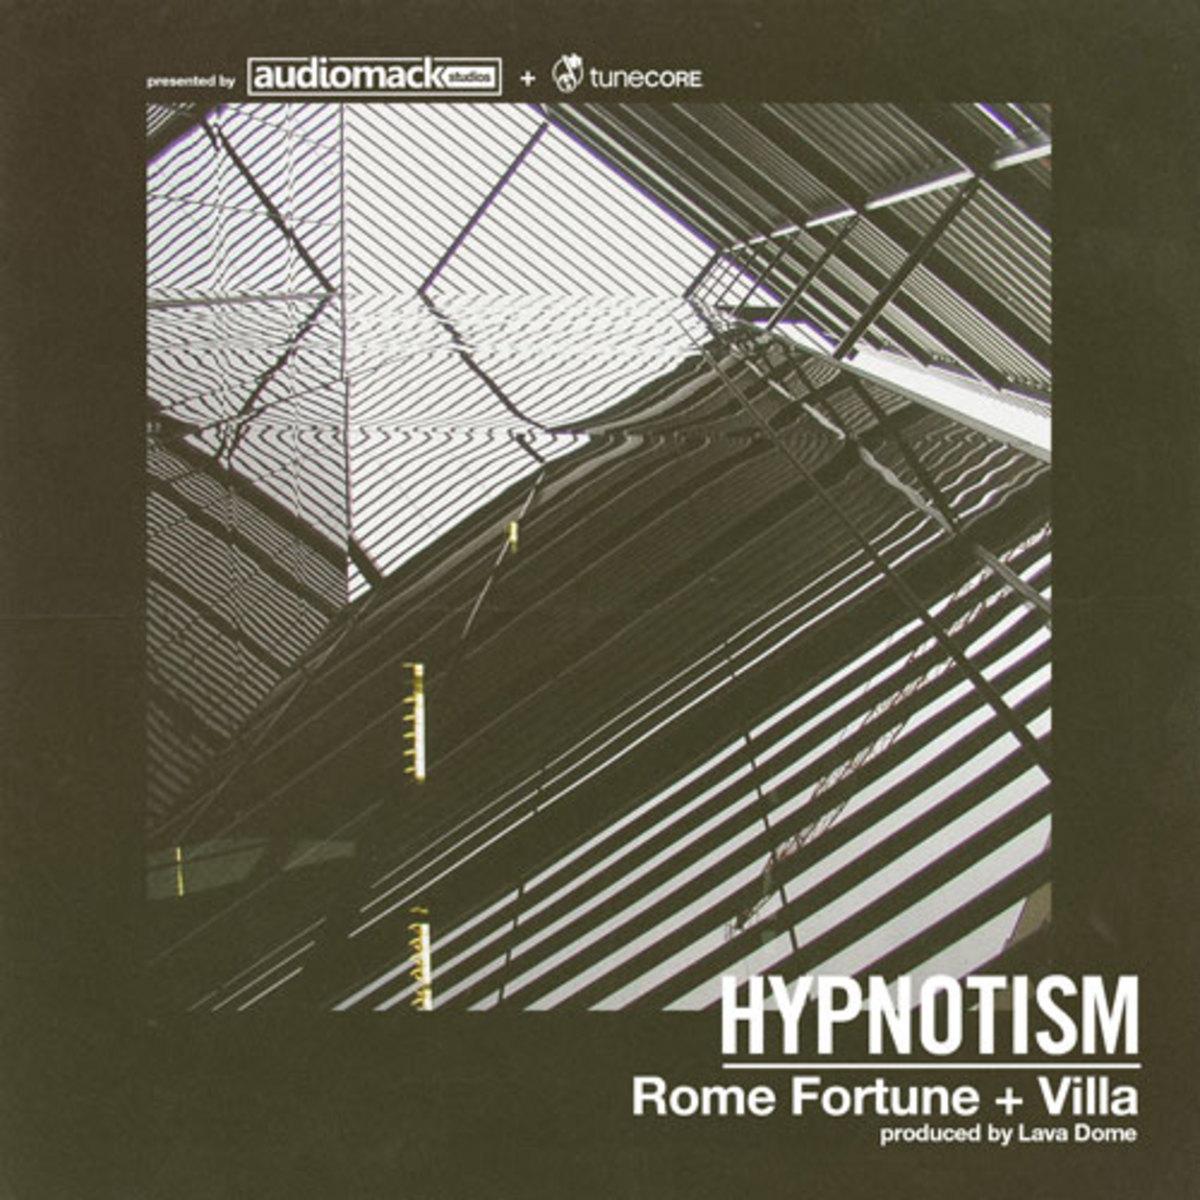 rome-fortune-hypnotism-artwork.jpg